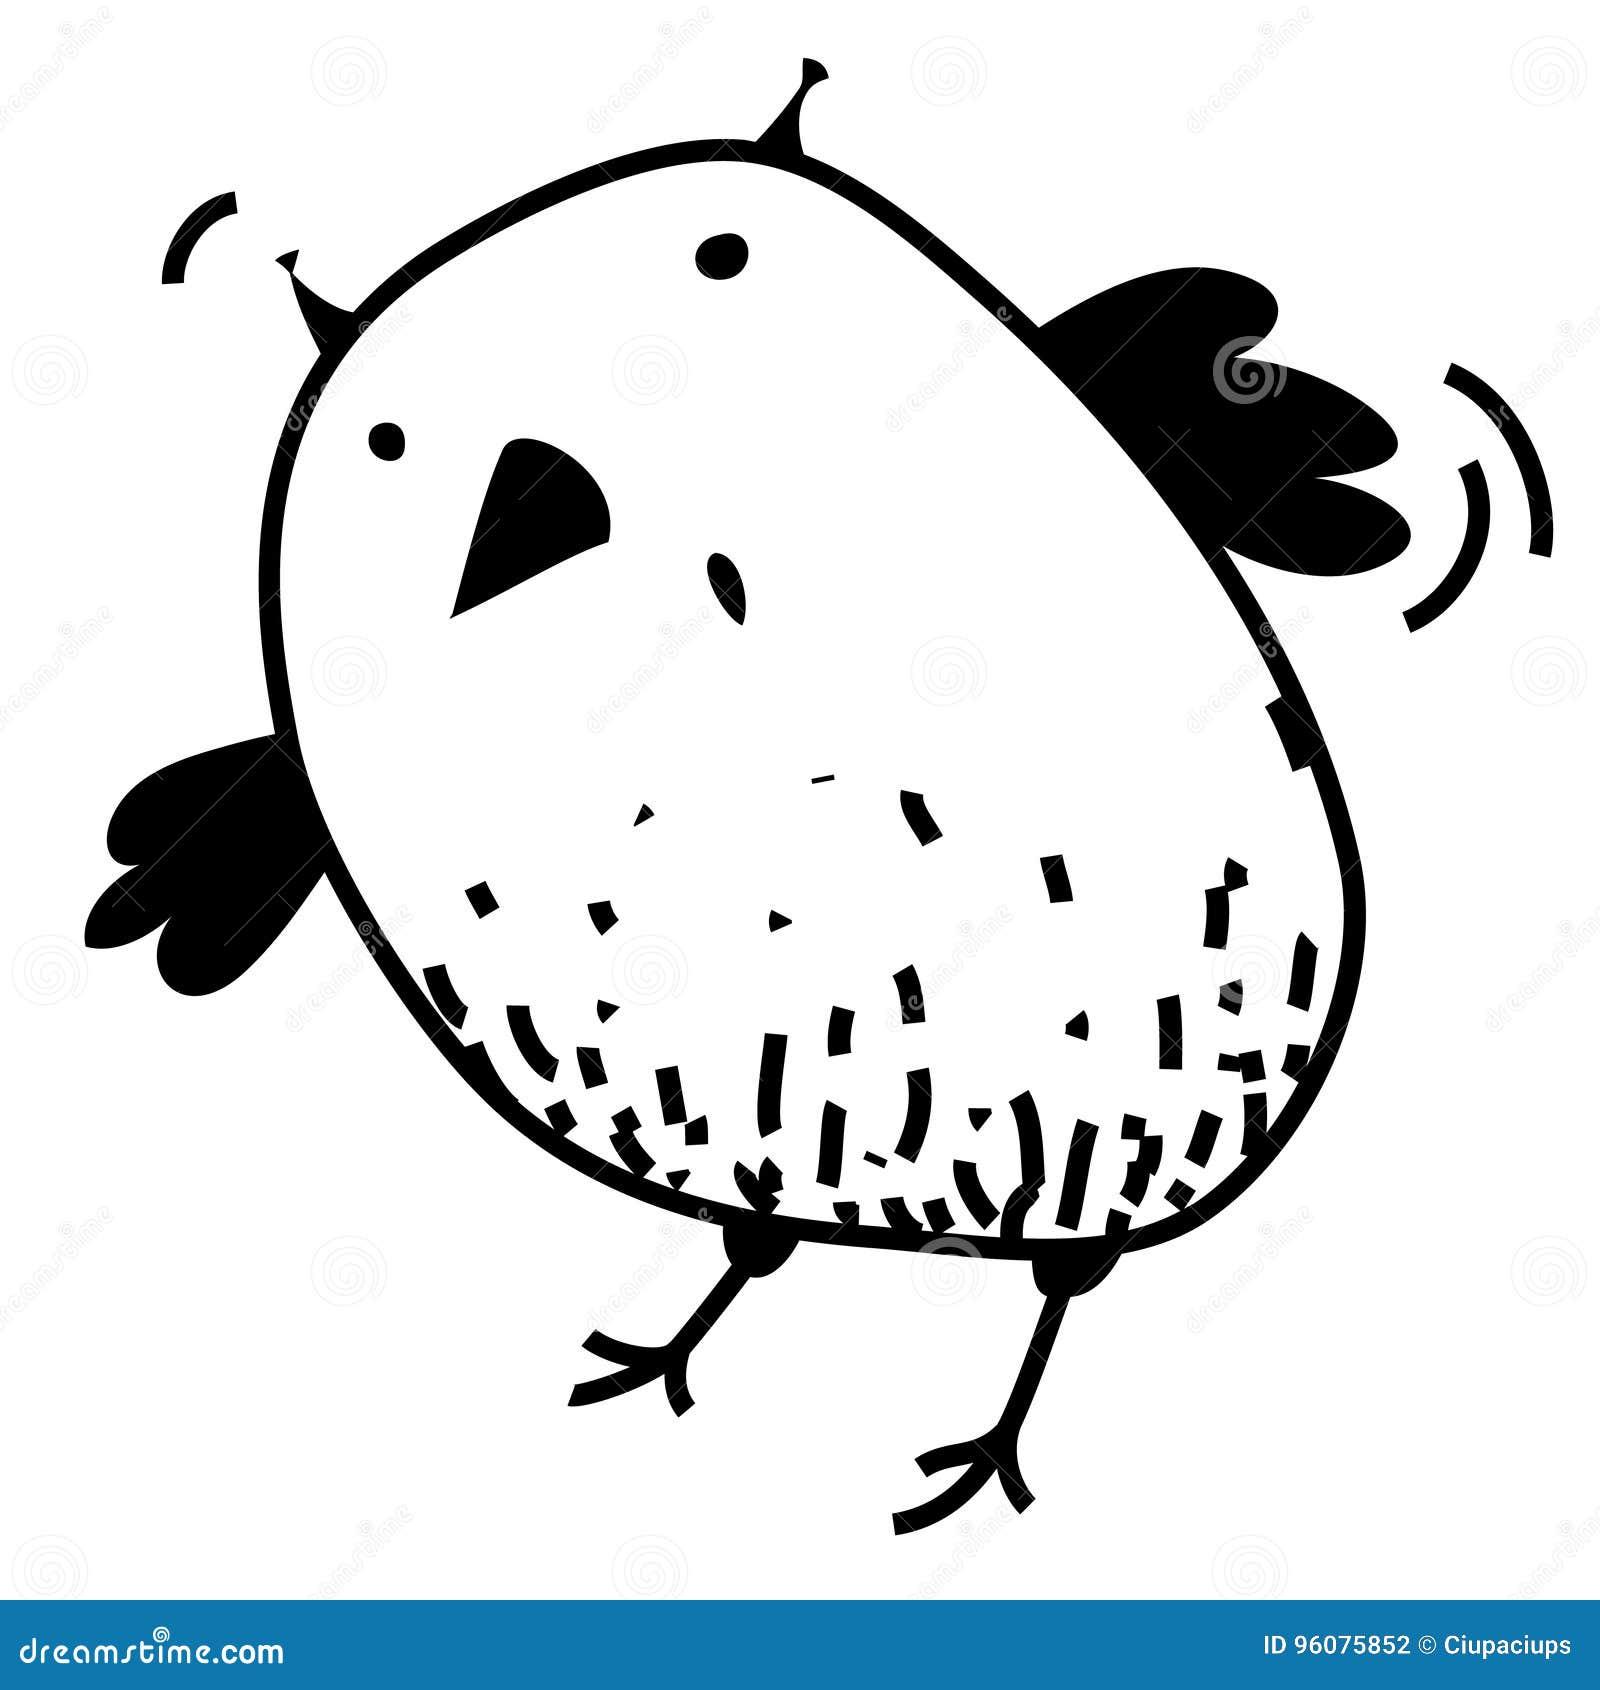 Cute Surprised Eagle Owl Colorless Contour Outline Funny Cartoon